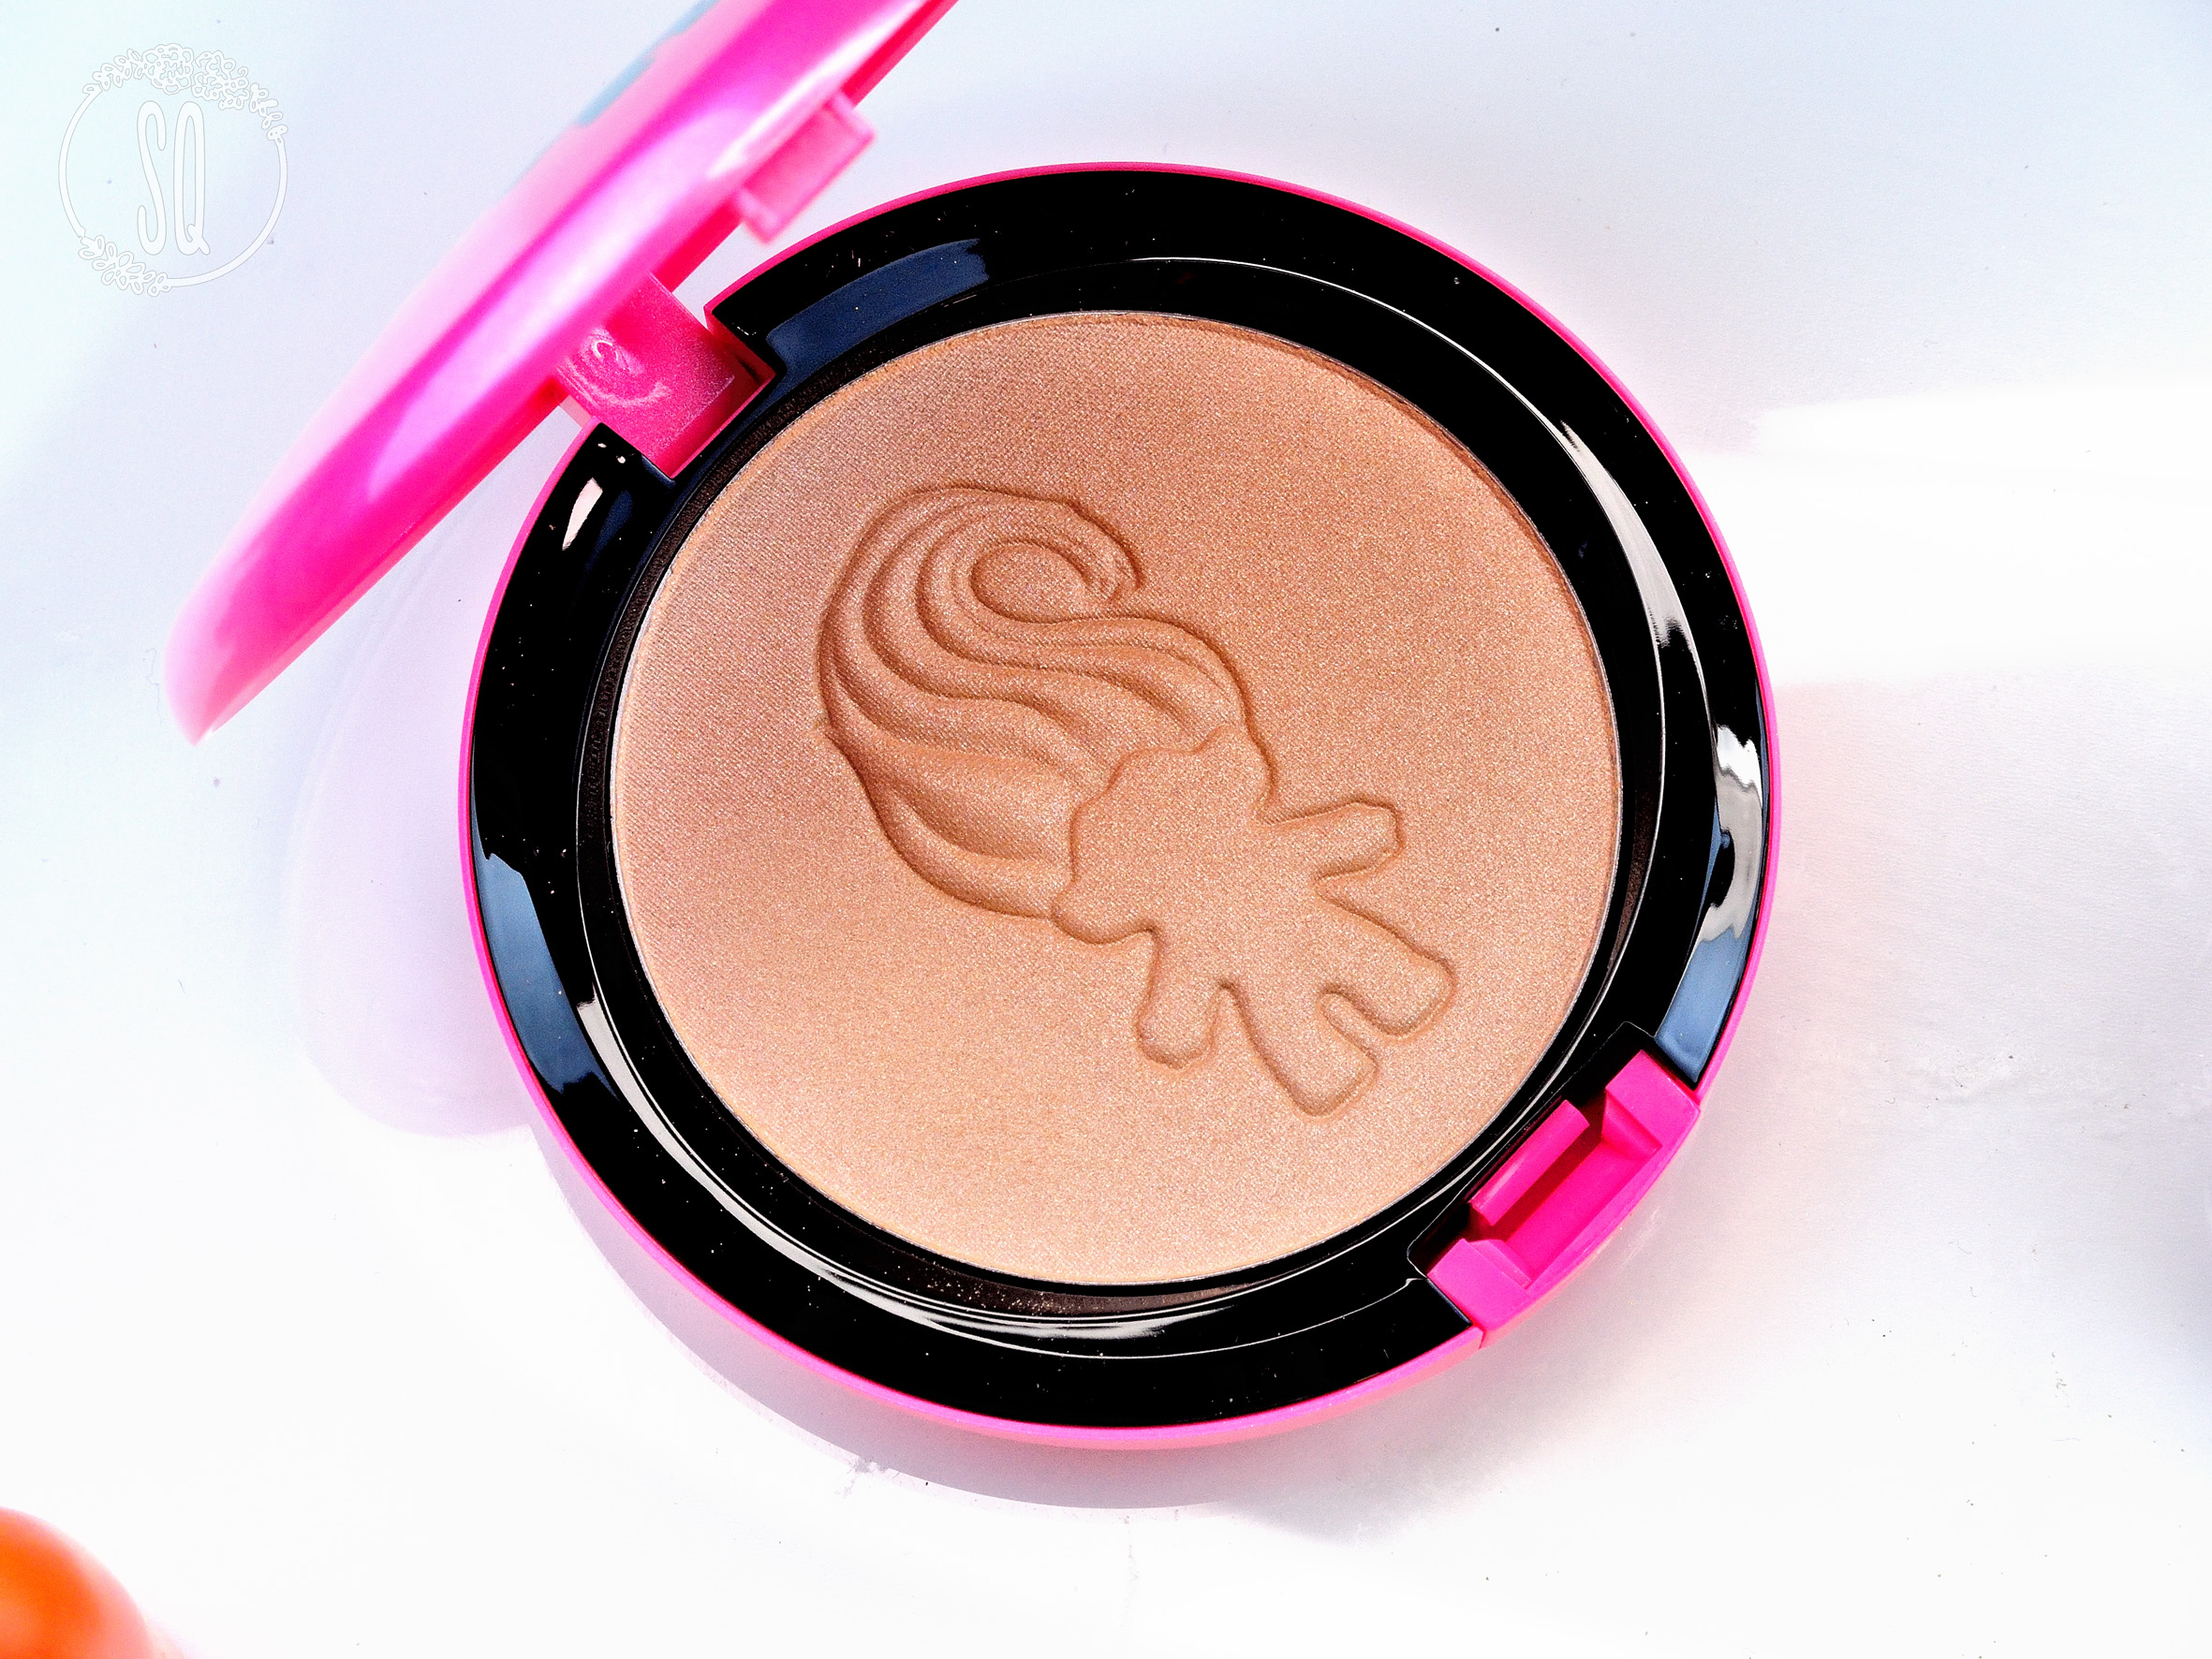 Beauty Powder Glow Rida Good Luck Trolls M·A·C